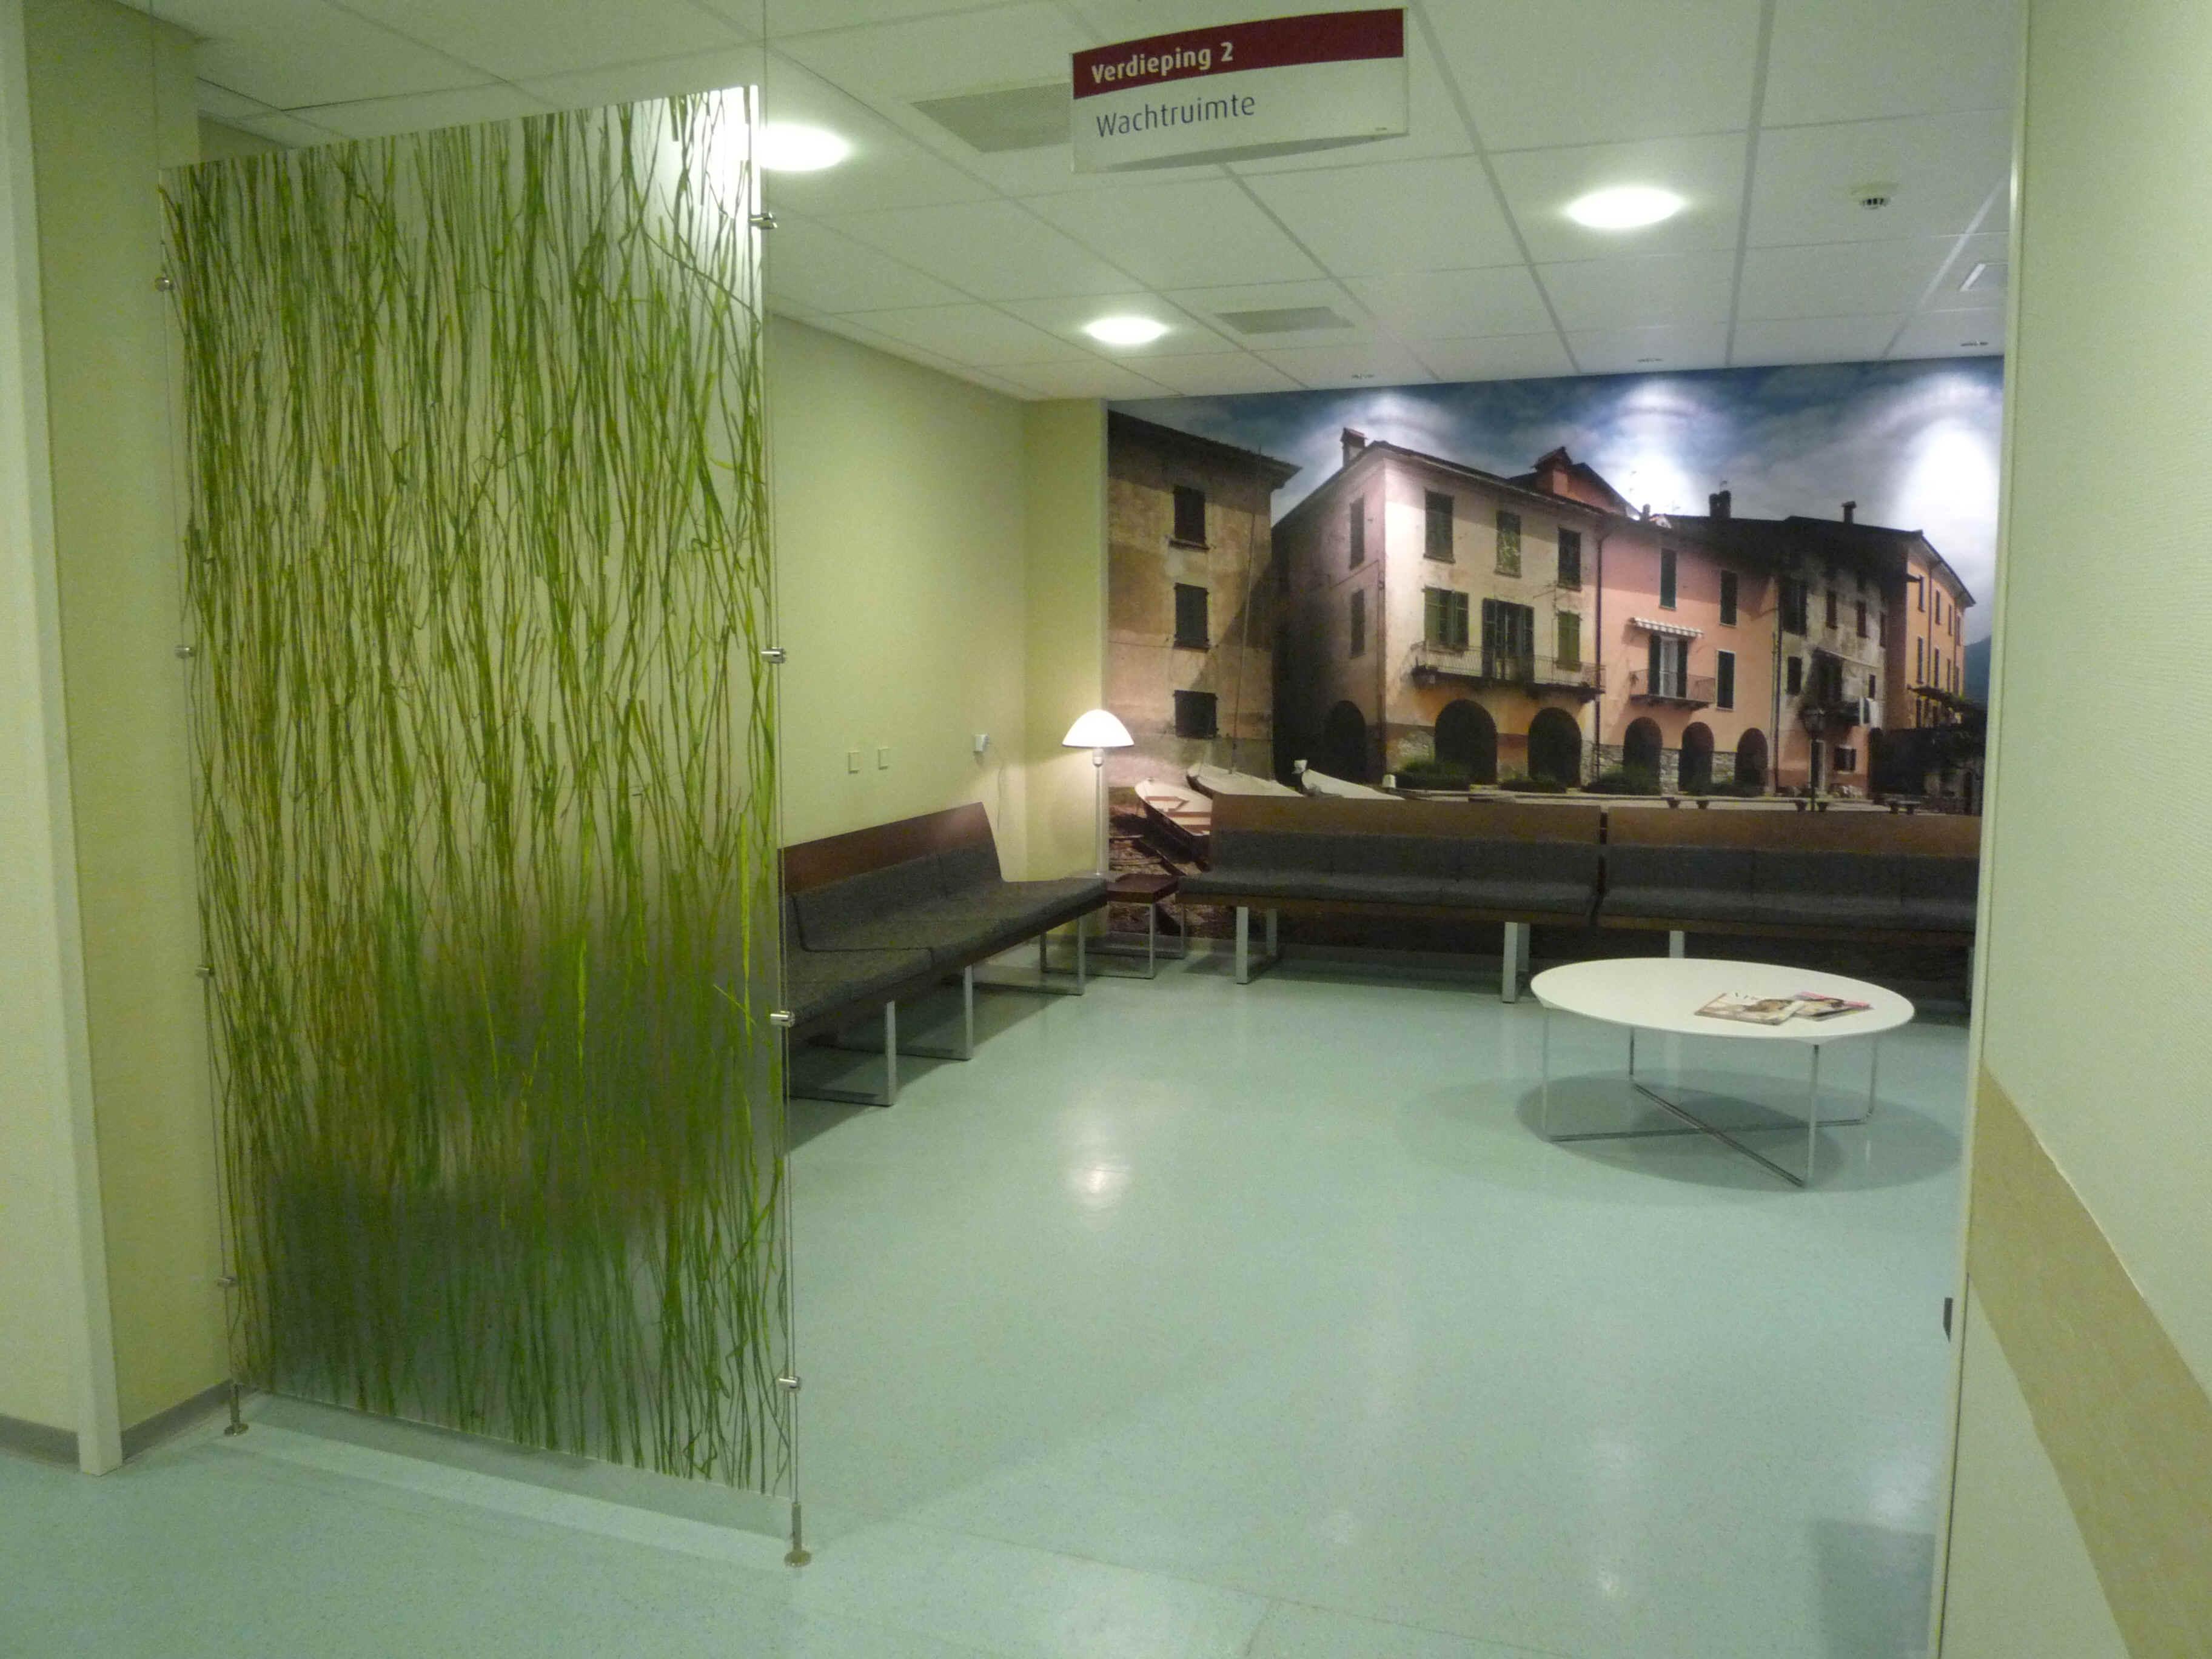 Luxe bamboe interieur badkamermeubels ontwerpen 2017 for Badkamermeubel ontwerpen